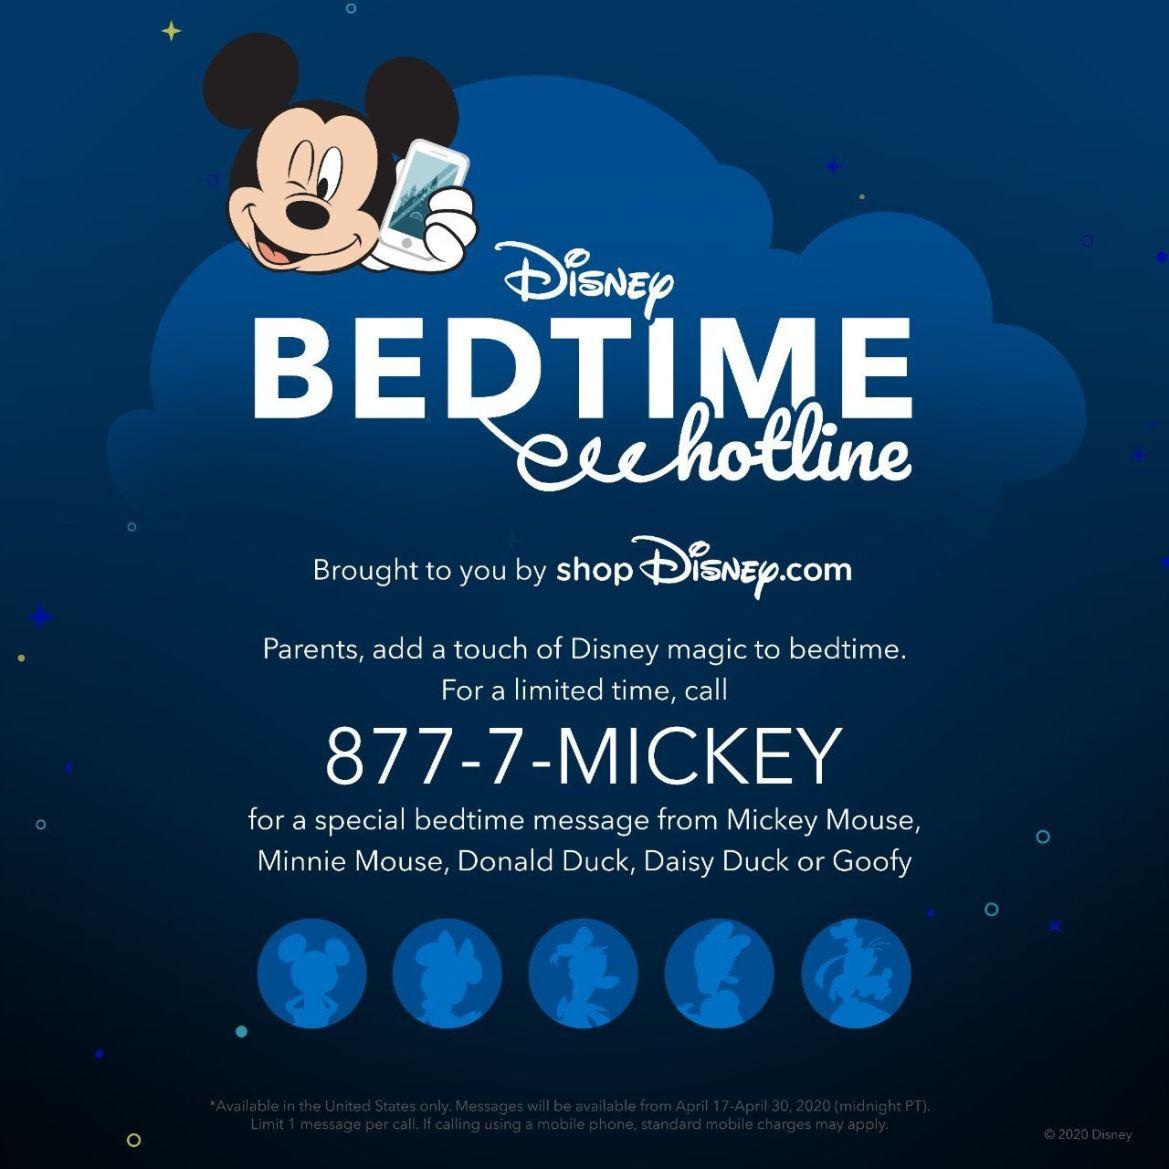 bedtime-hotline